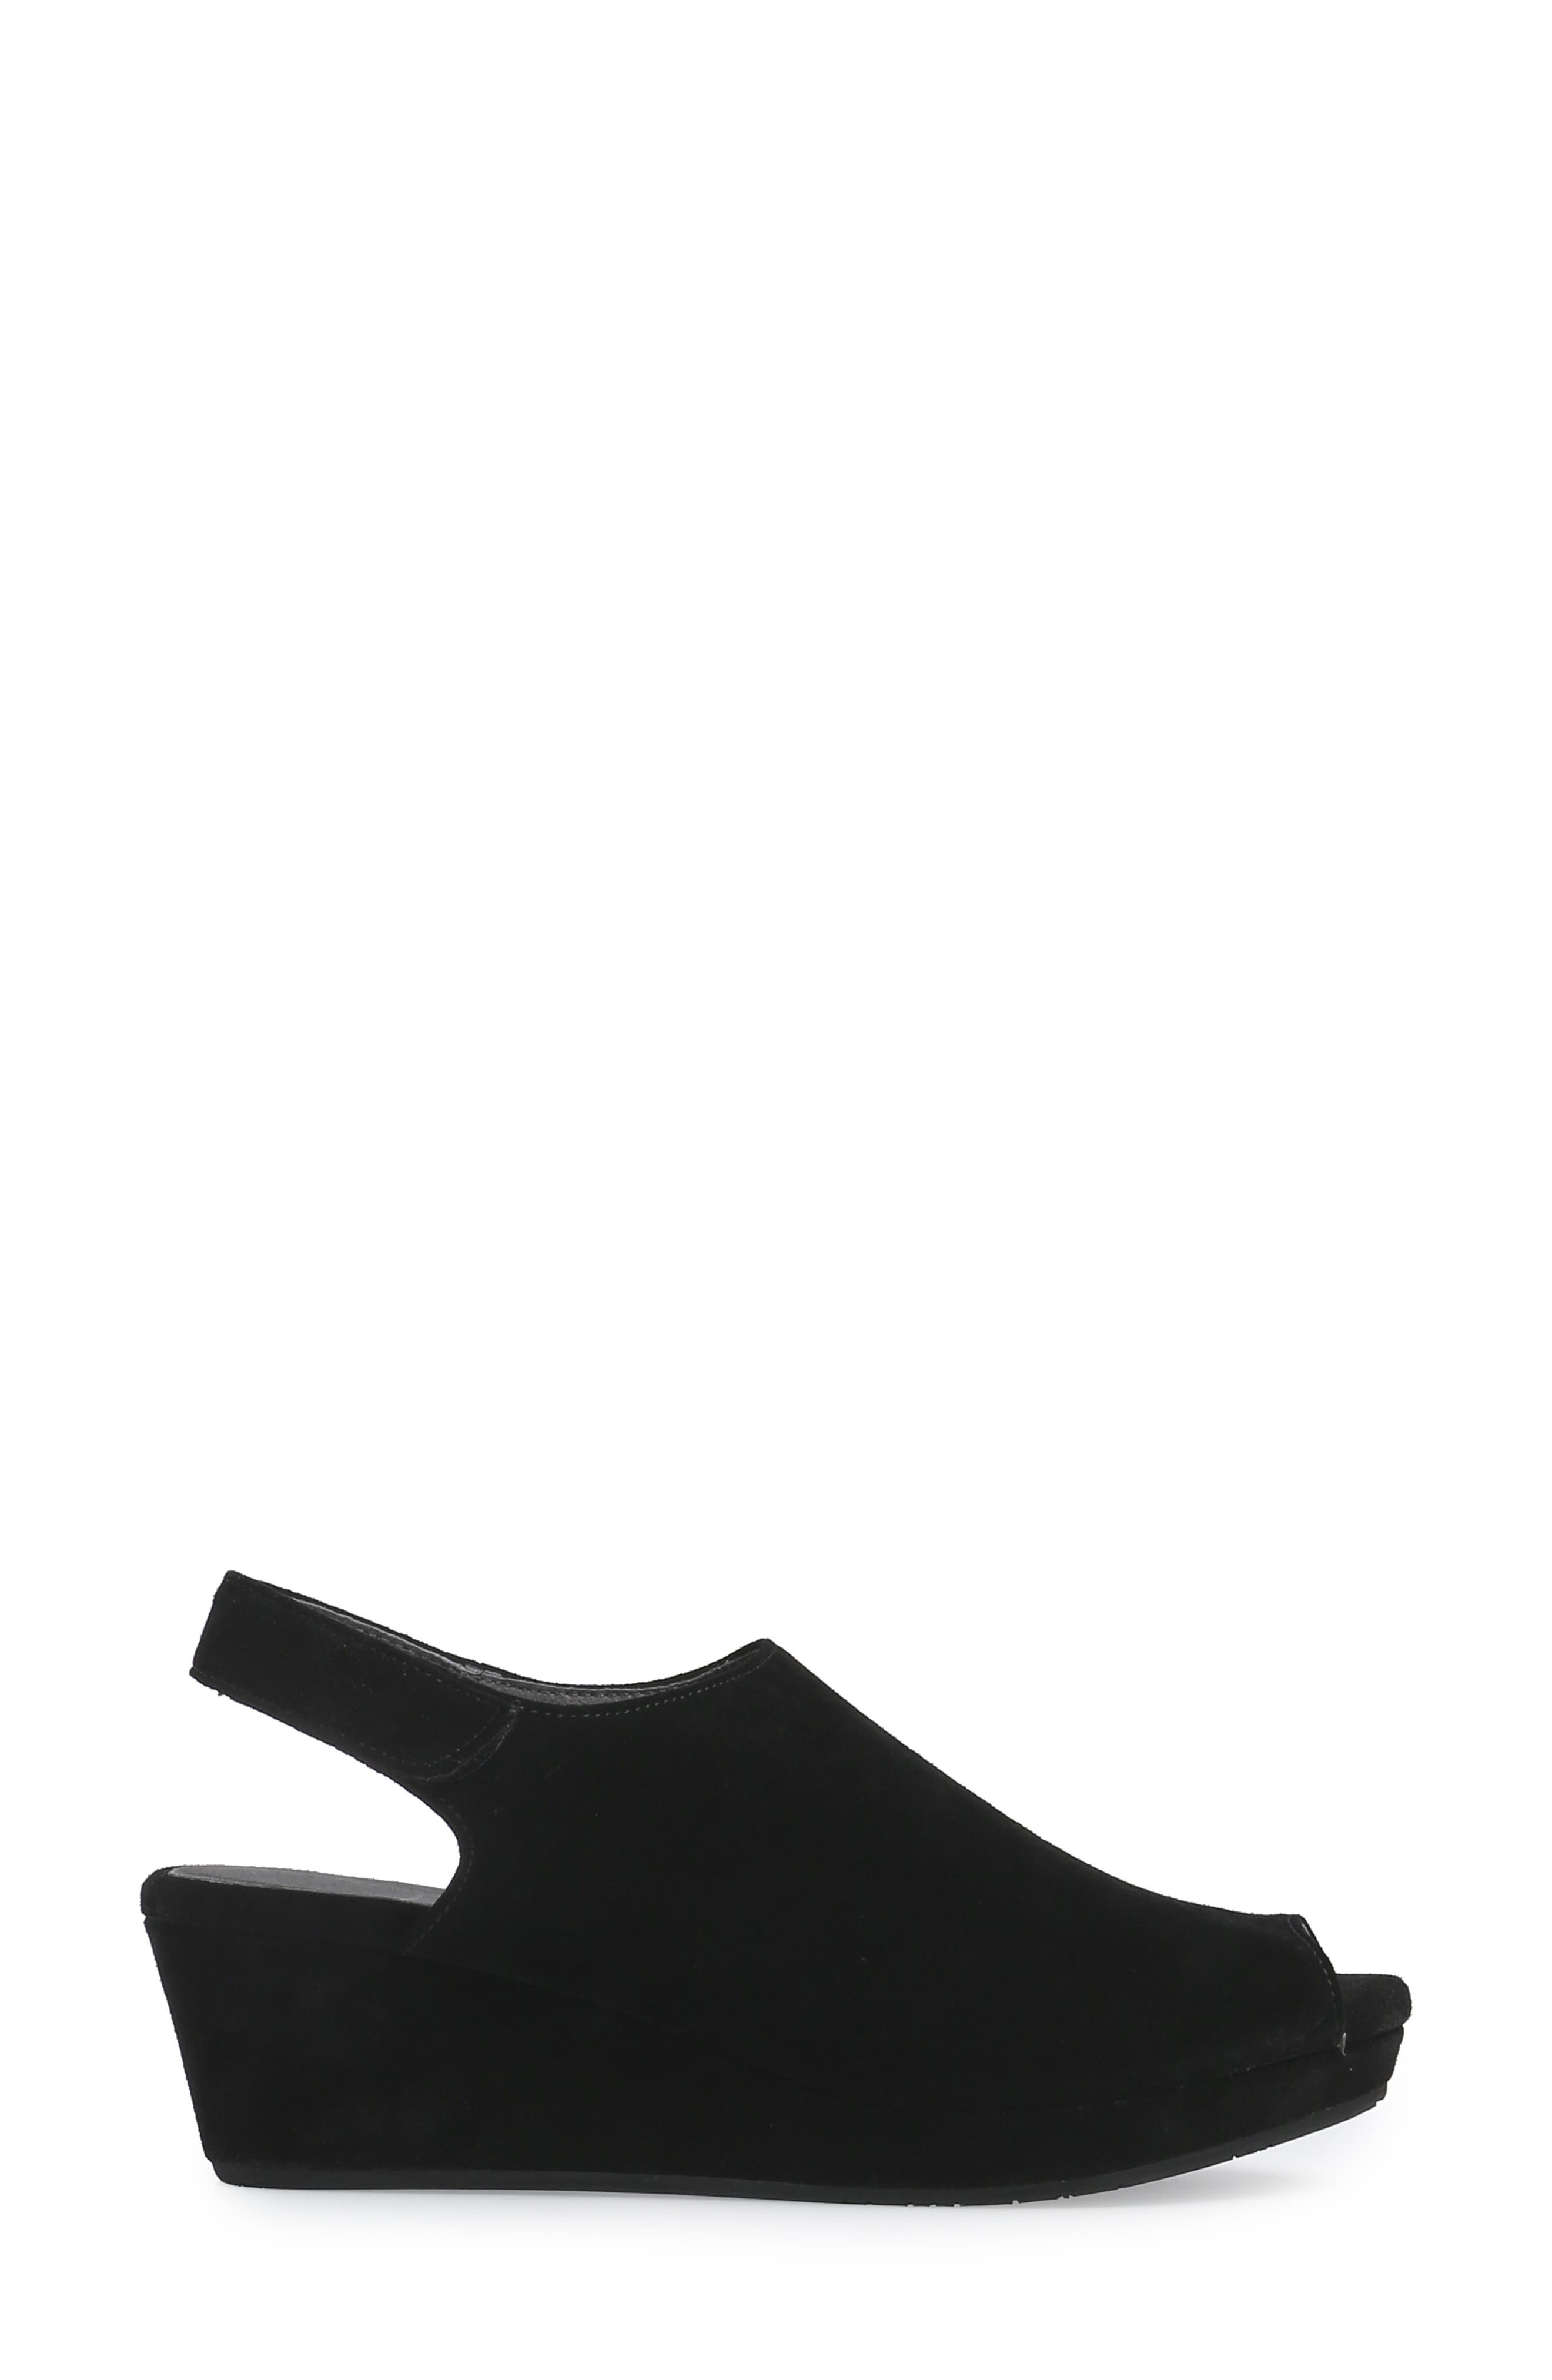 Yana Wedge Sandal,                             Alternate thumbnail 3, color,                             BLACK SUEDE